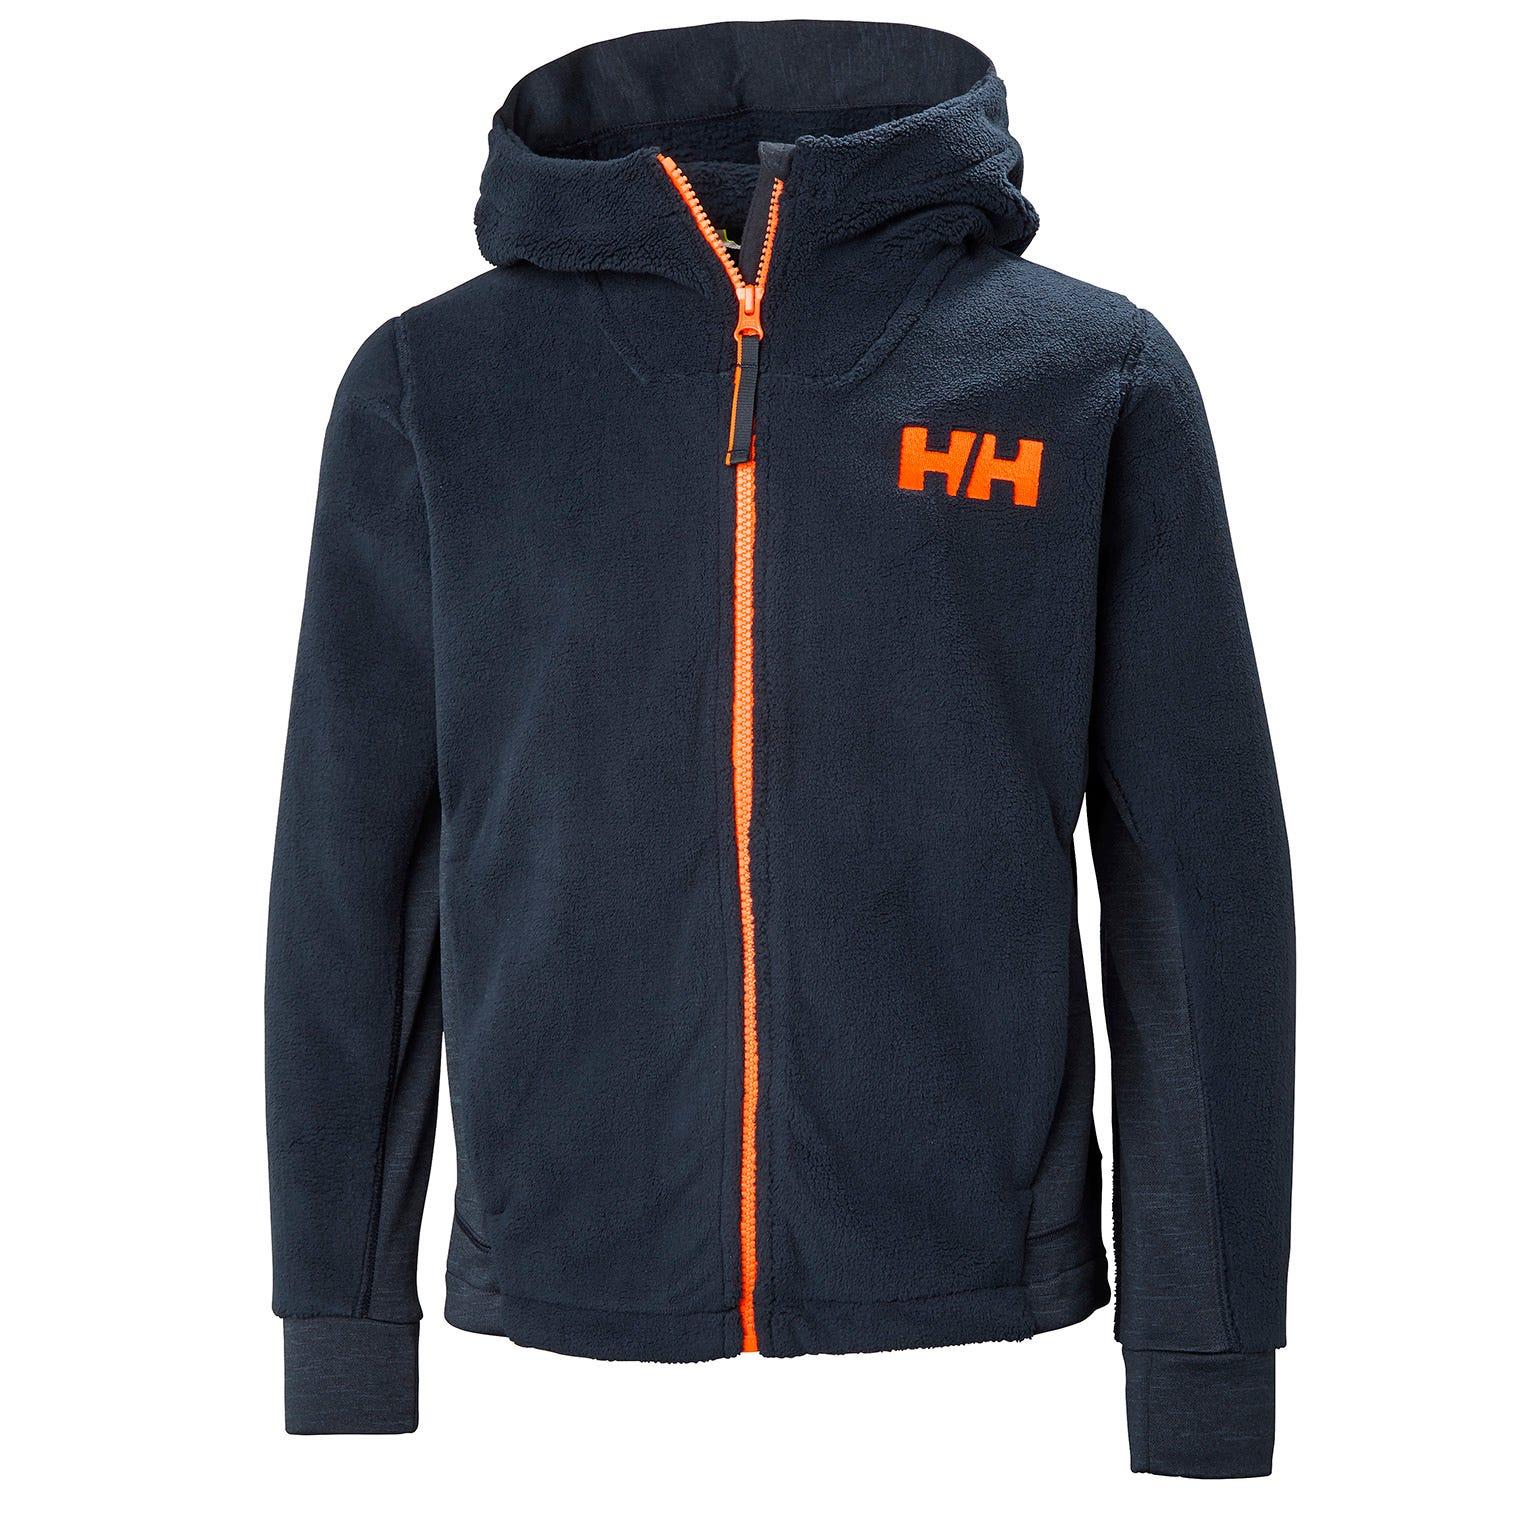 Helly Hansen Junior Chill Fz Hoodie Kids Fleece Navy 164/14